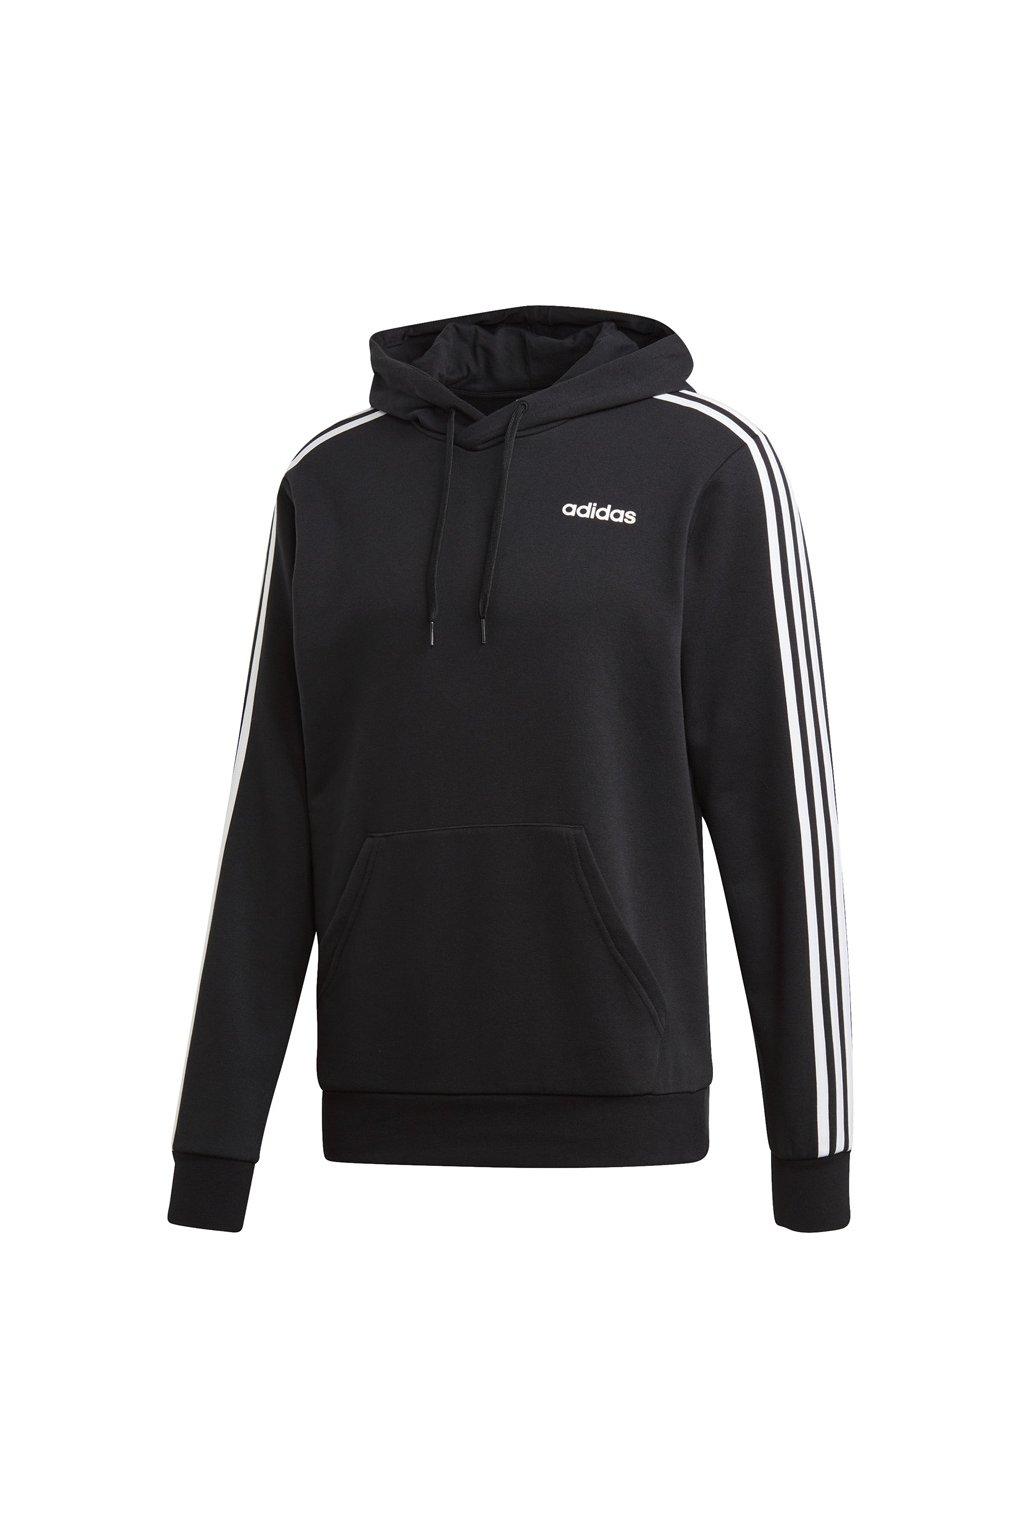 Pánska mikina Adidas Essentials 3 Stripes Pullover French Terry black / black DU0498